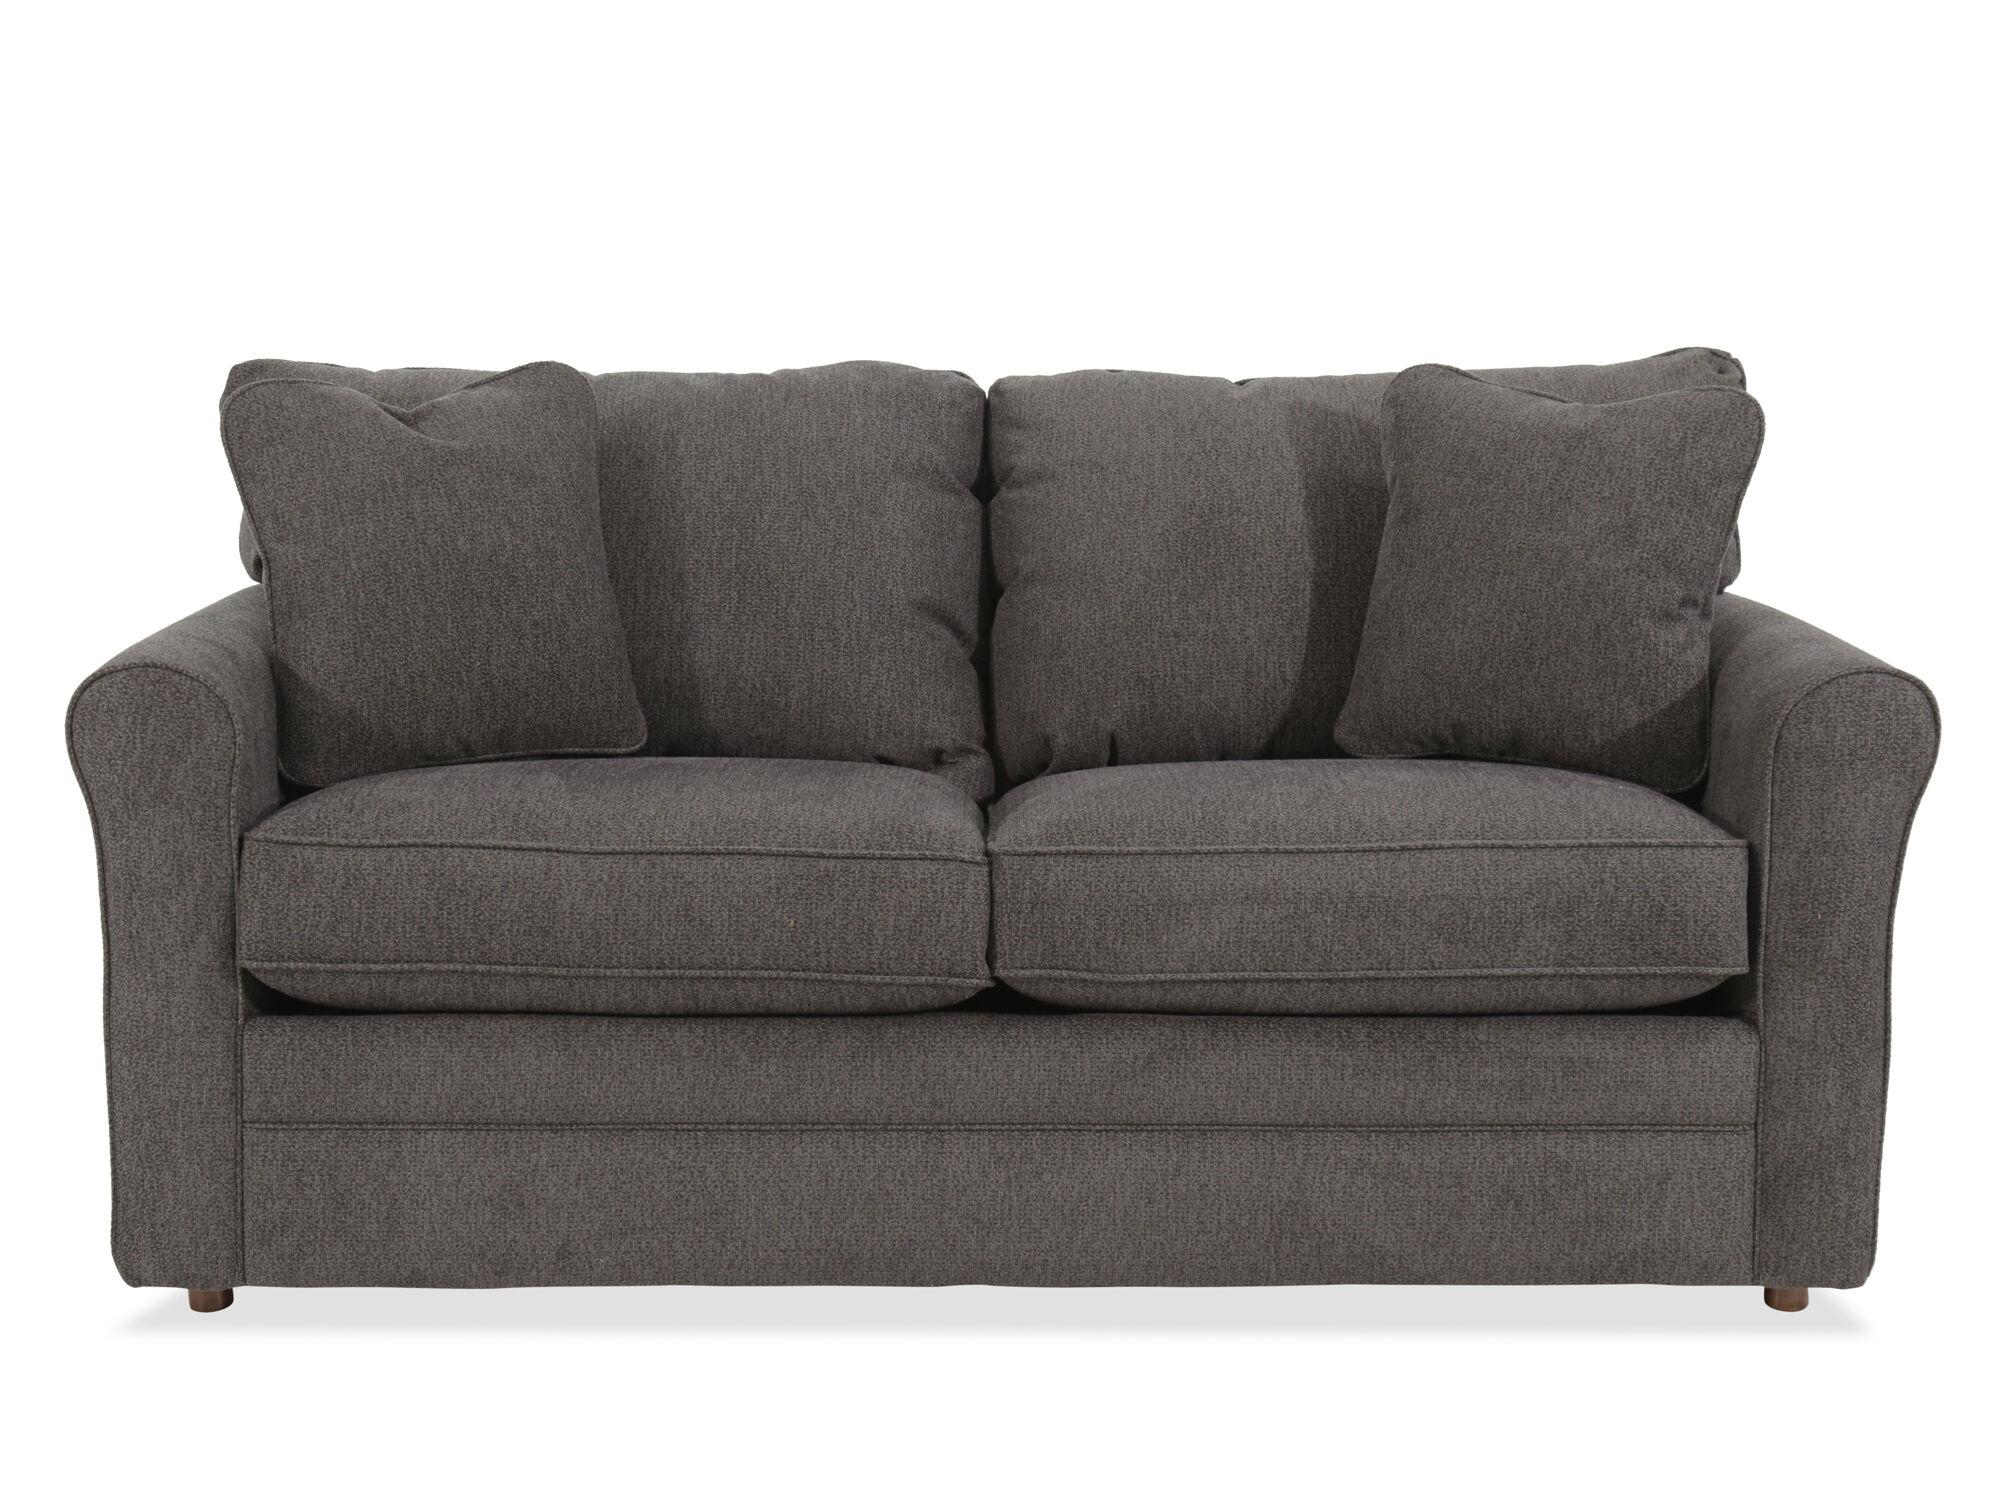 la z boy diana sleeper sofa white cotton duck slipcovers natalie premier supreme comfort